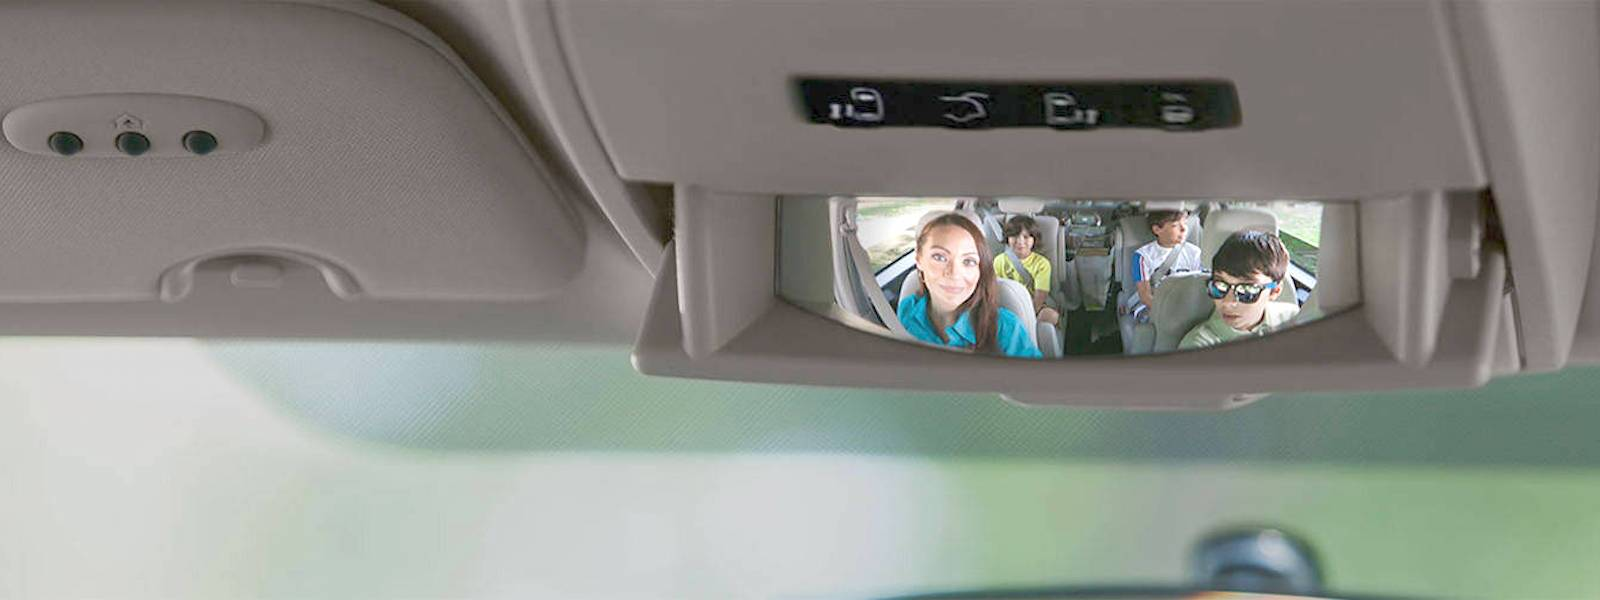 2016 Dodge Grand Caravan Safety